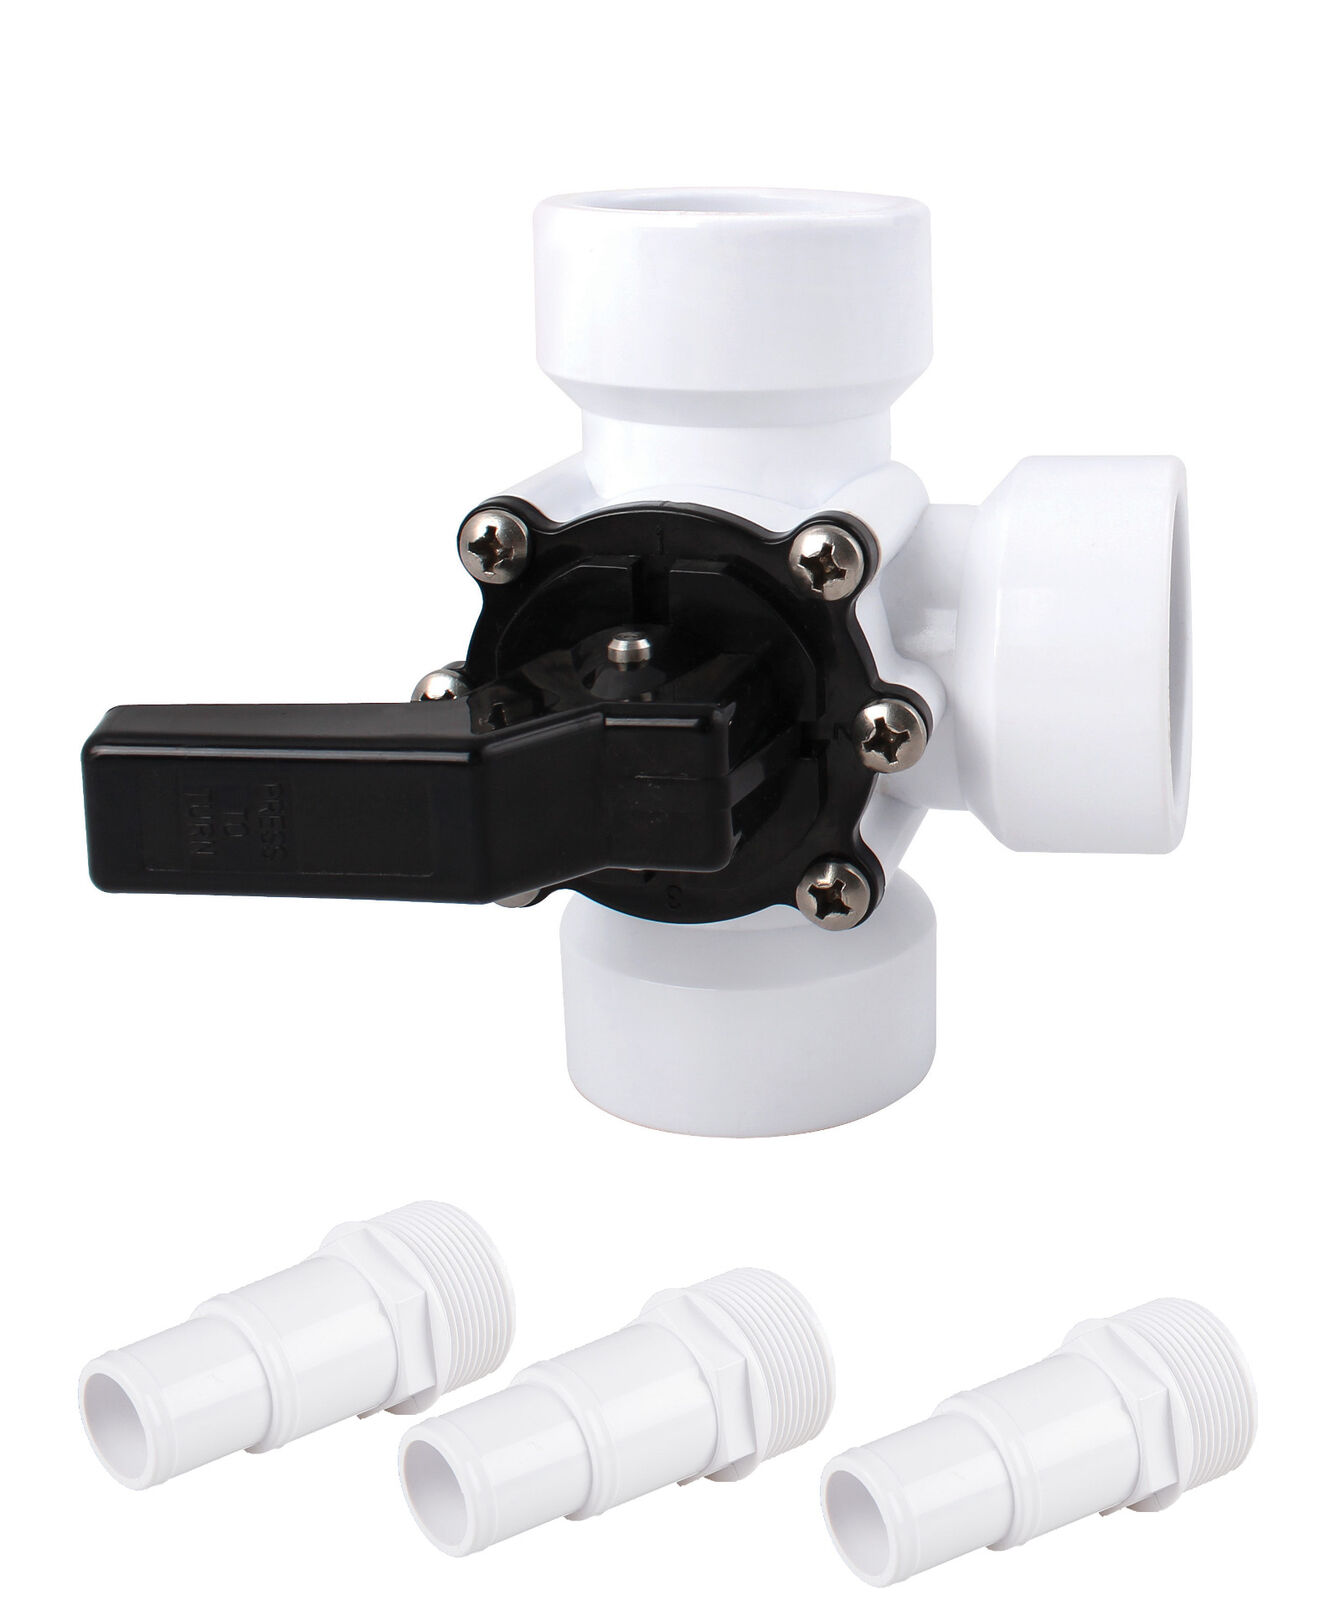 3 wegeventil bypass adapter pool pumpe. Black Bedroom Furniture Sets. Home Design Ideas